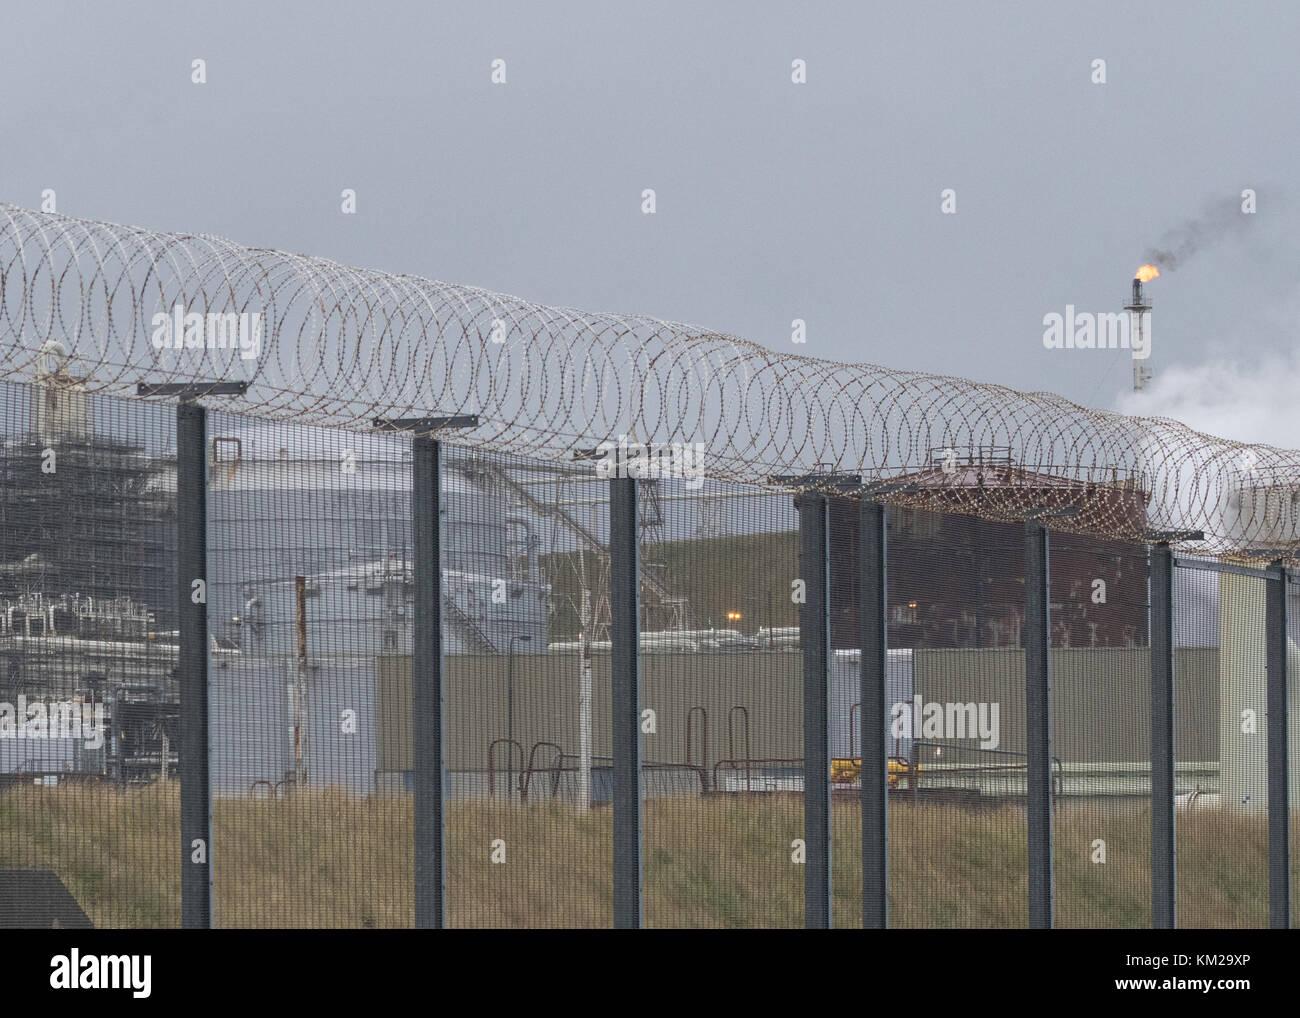 Razor-wire Security fencing at Sullom Voe Oil Terminal, Shetland Islands, Scotland, UK - Stock Image